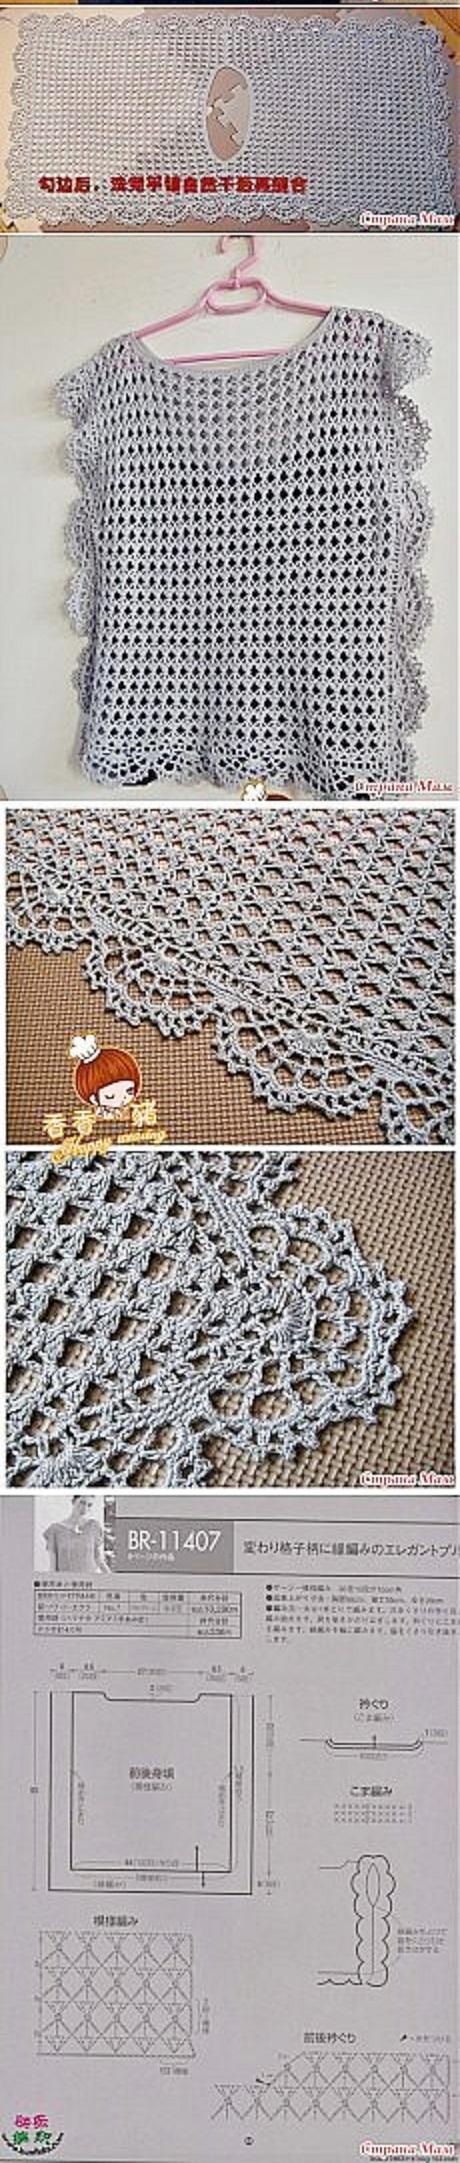 patron blusa facil crochet-otakulandia.es